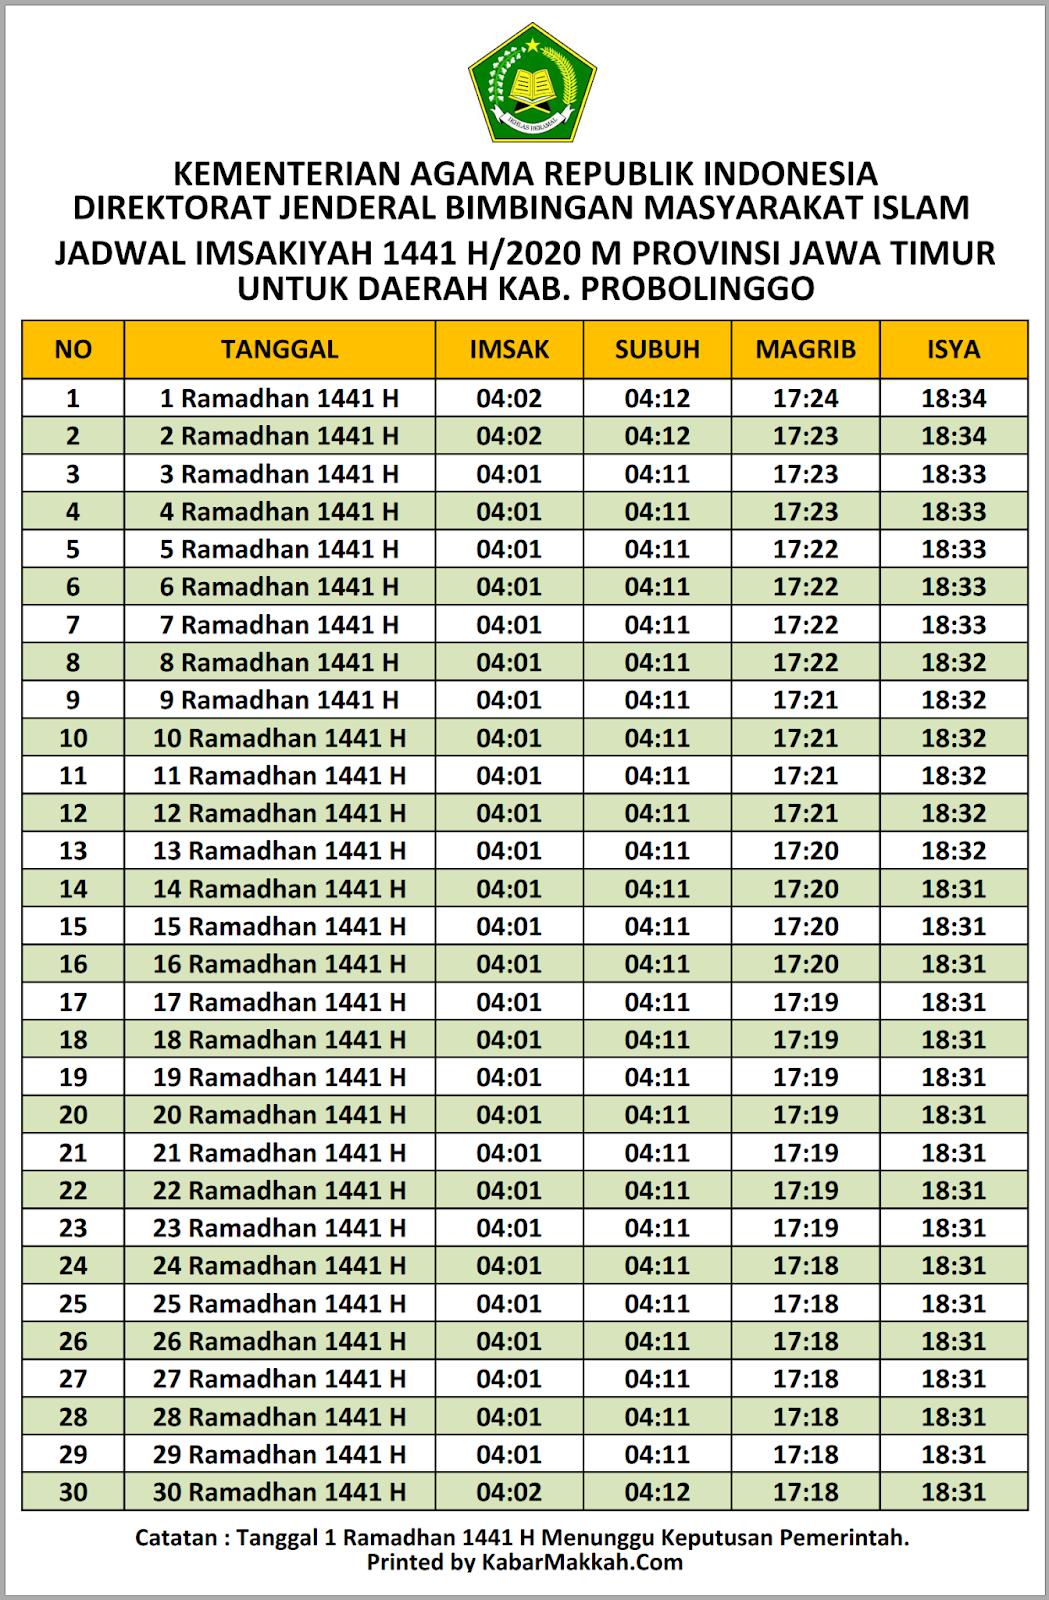 Jadwal Imsakiyah Probolinggo 2020